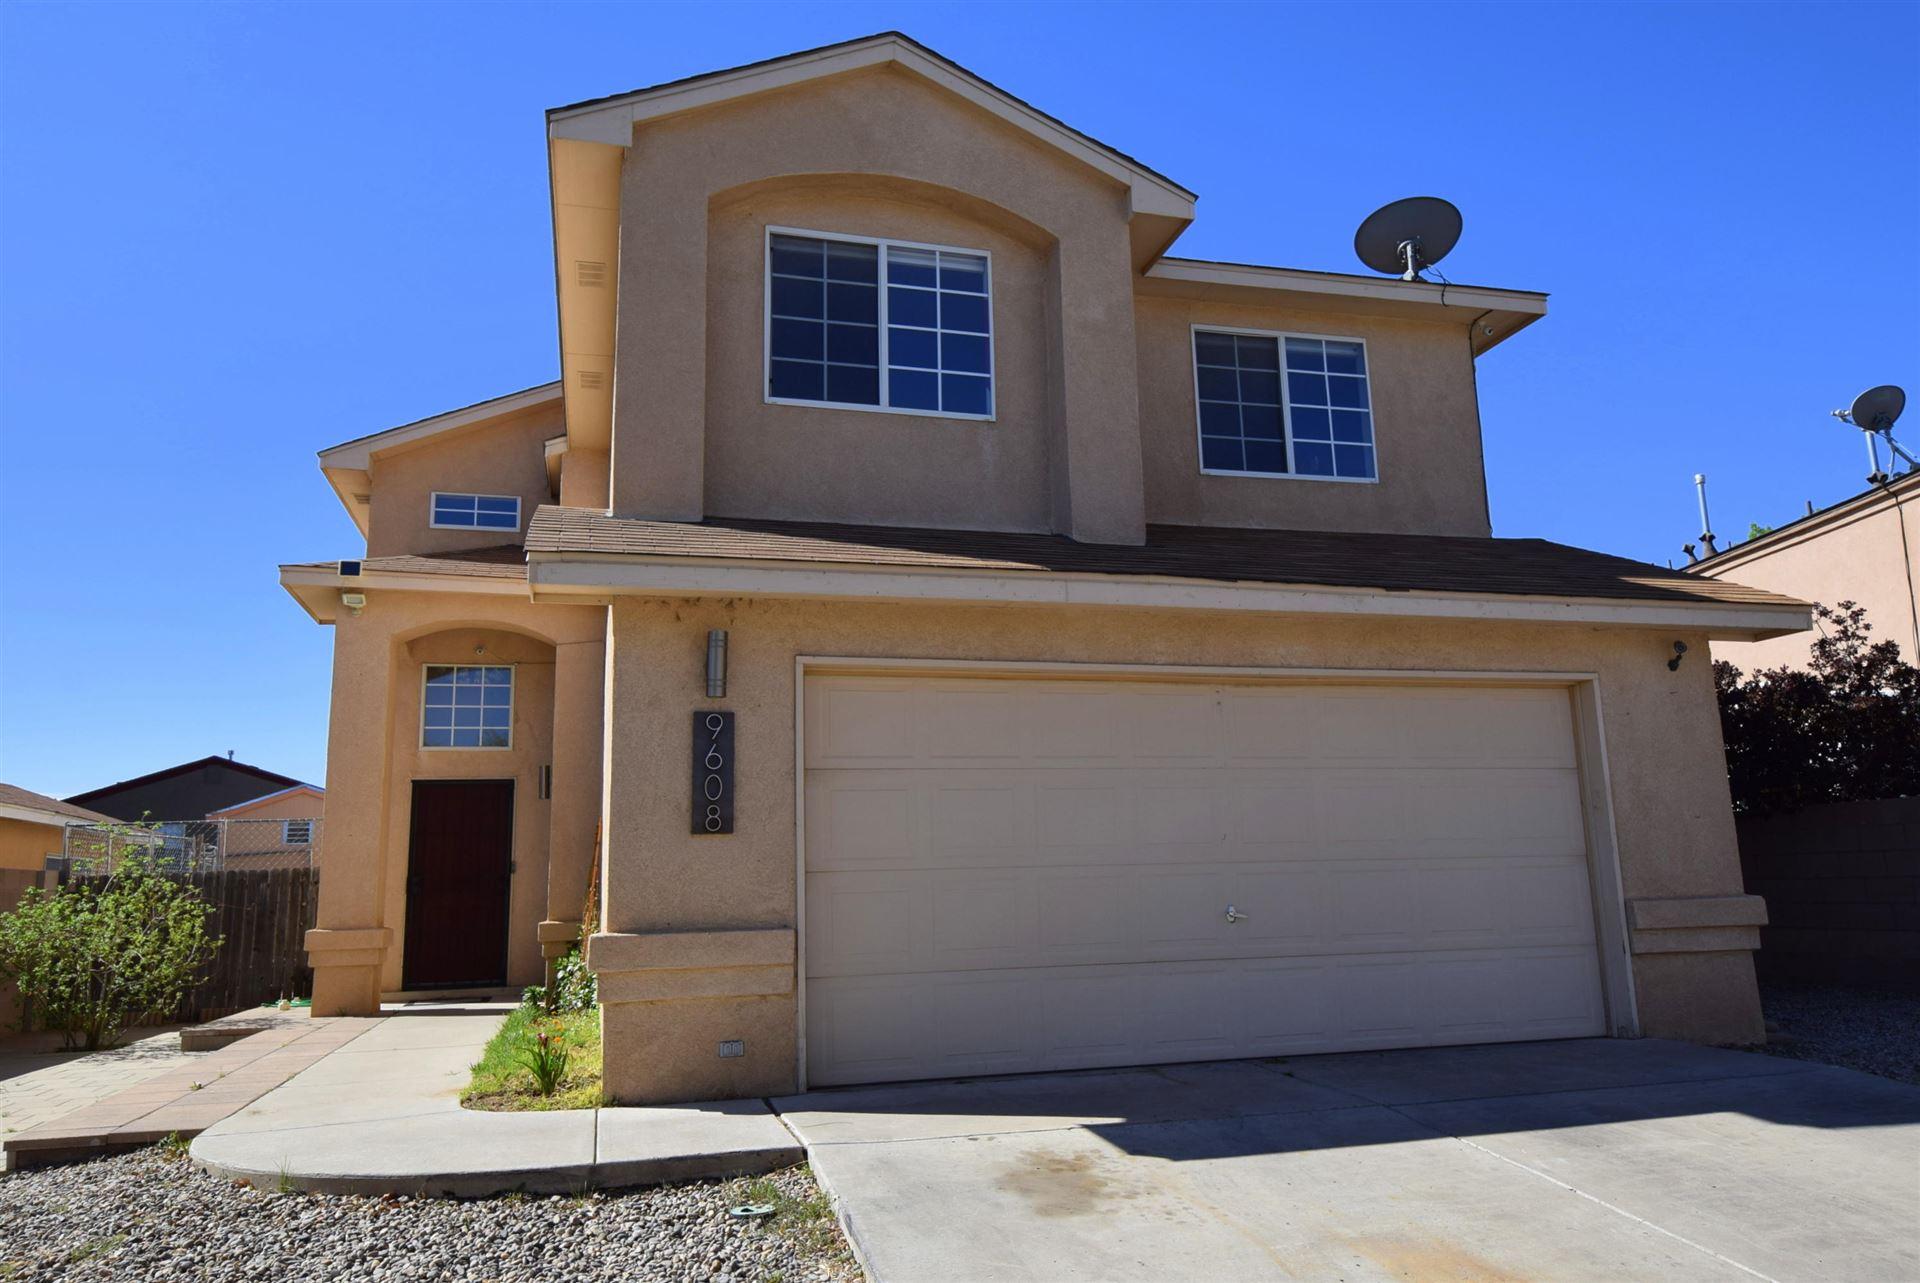 Photo of 9608 ROWEN Road SW, Albuquerque, NM 87121 (MLS # 989918)